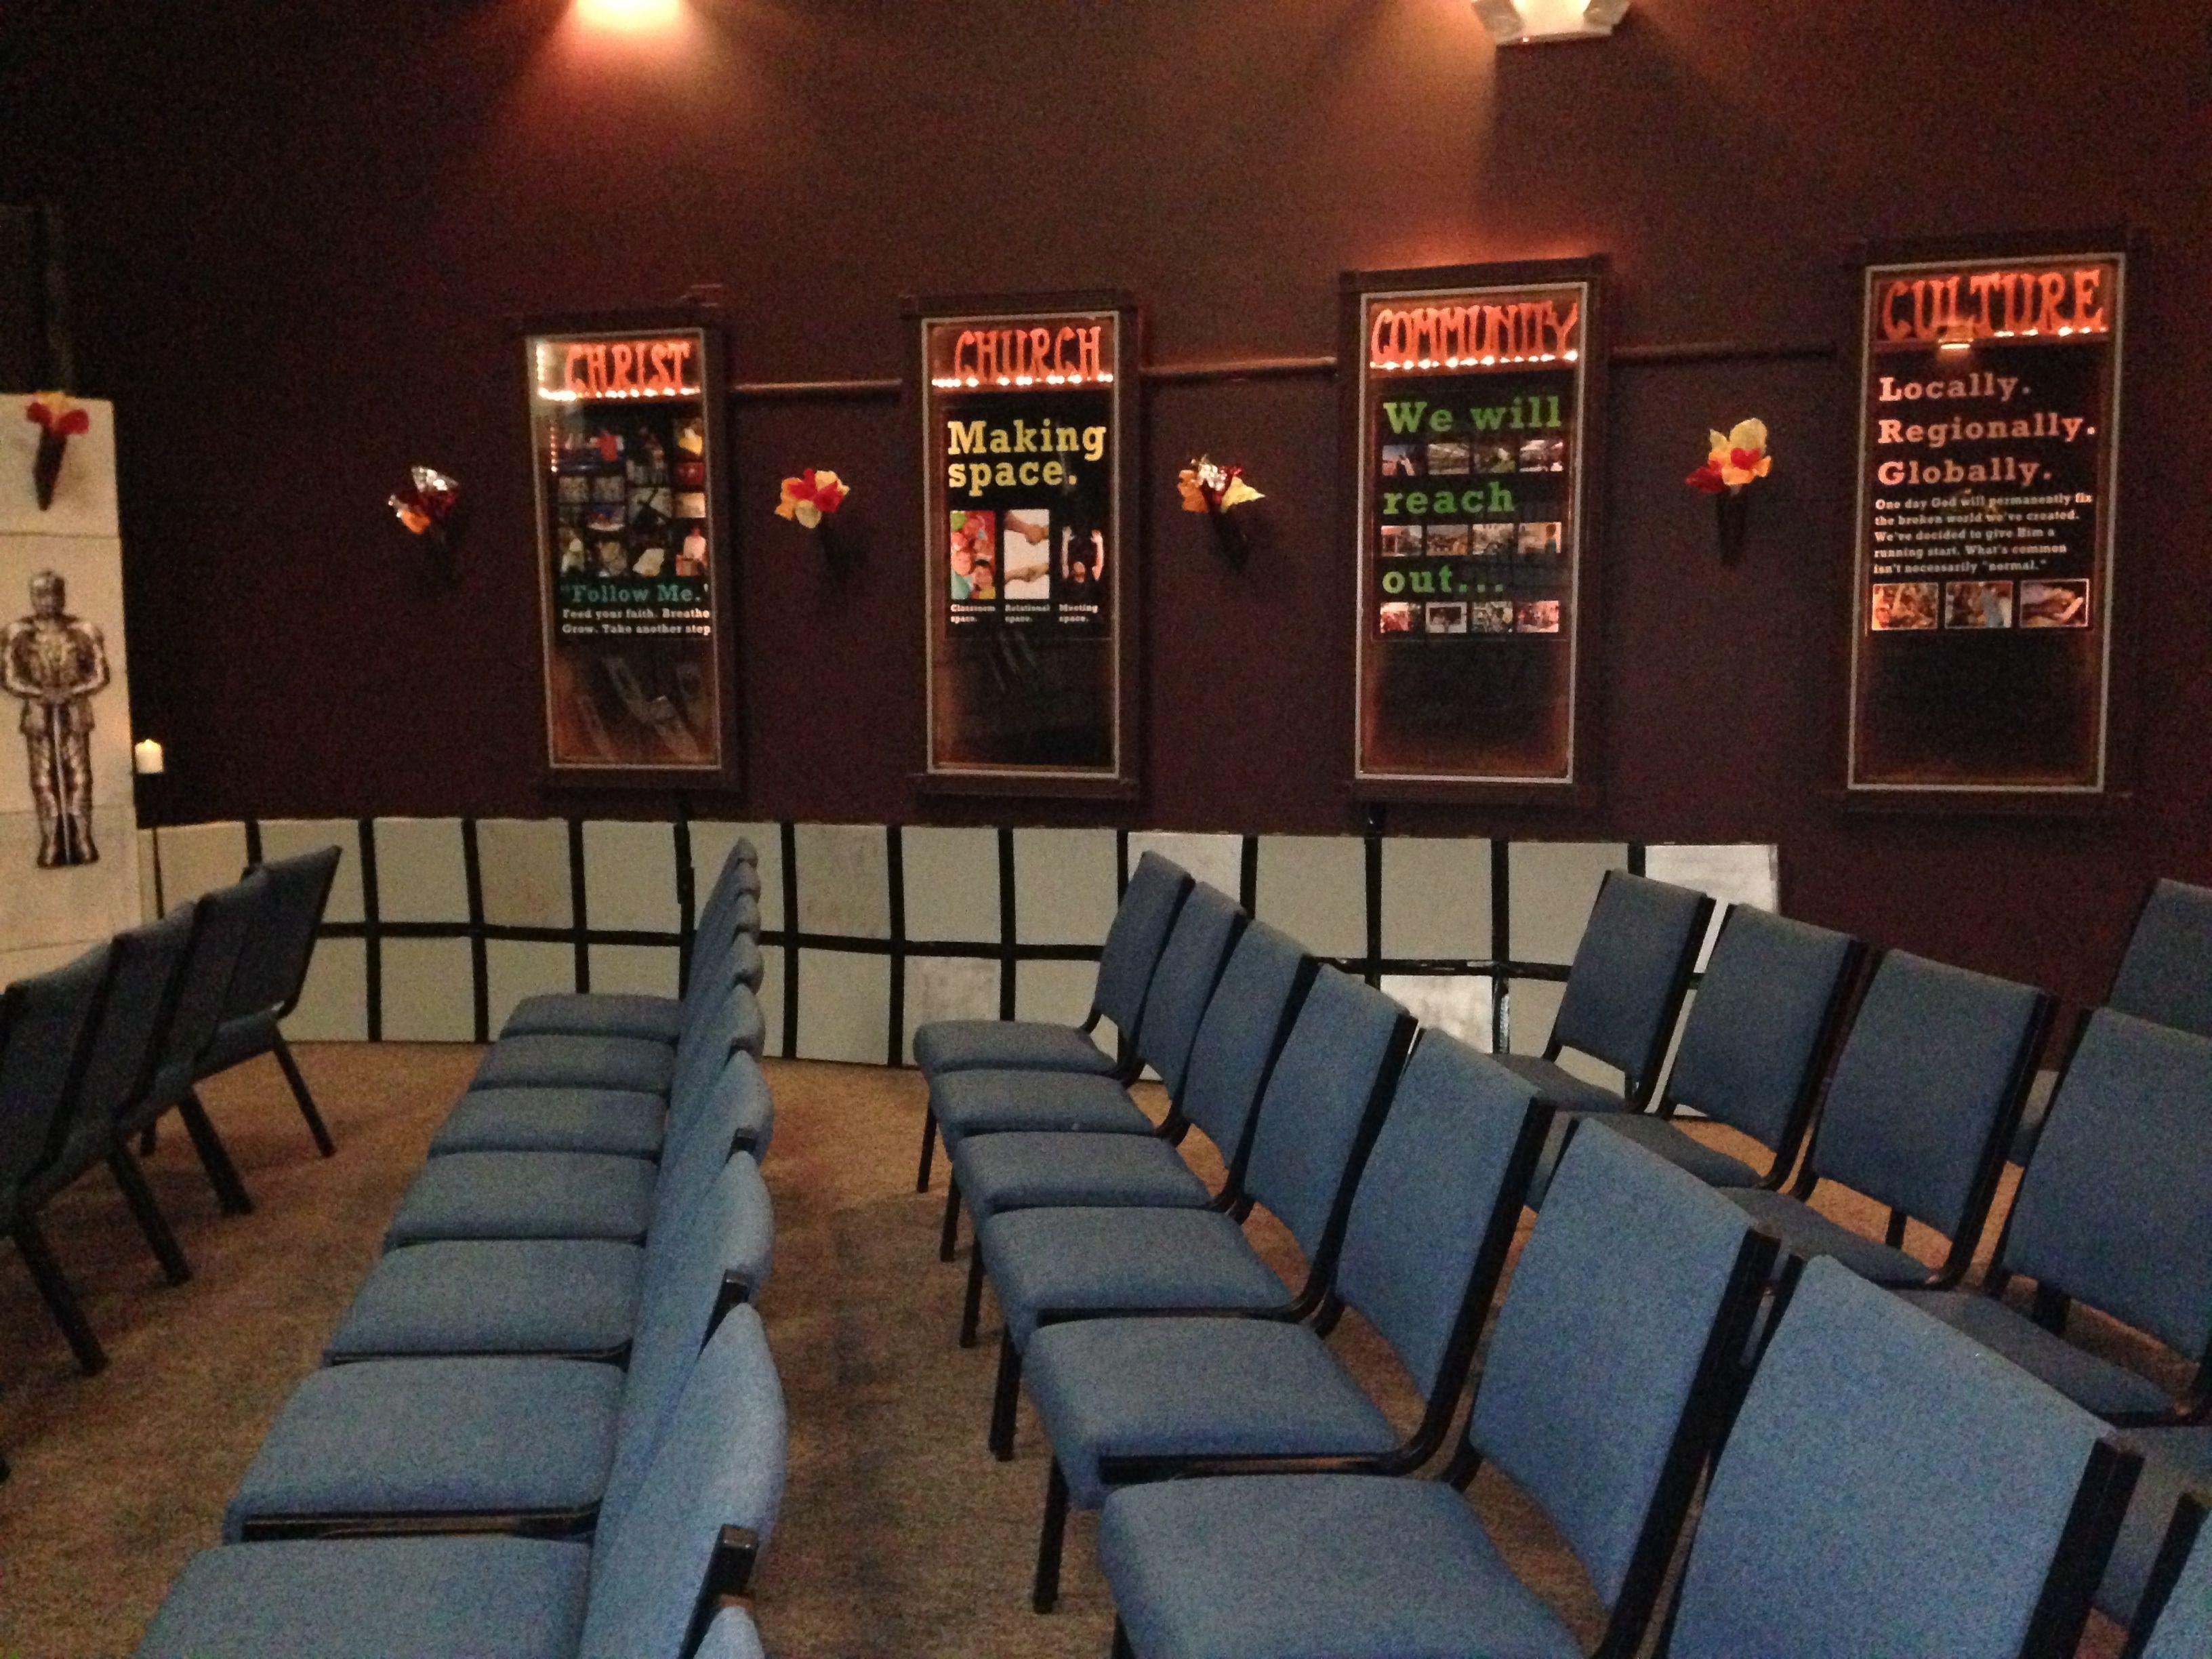 Pizza box walls and paper towel torches - Kingdom Rock VBS Connection Church Medina, Ohio